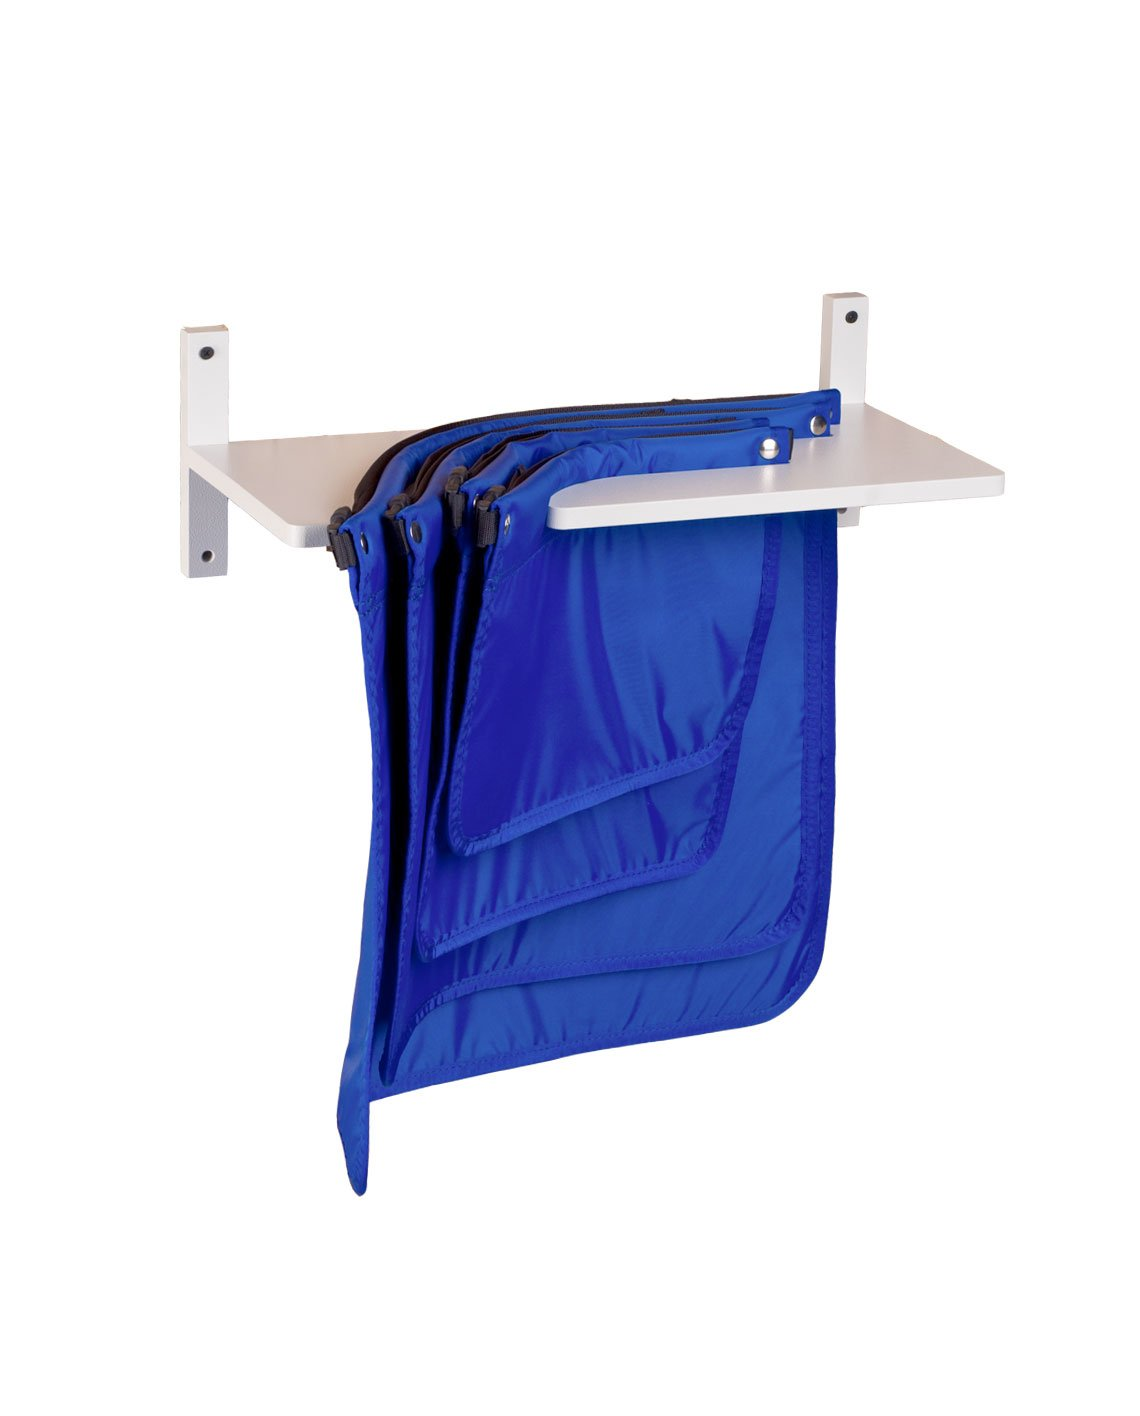 Patient X-ray Protection Lead Apron & Hanger Set – 683400